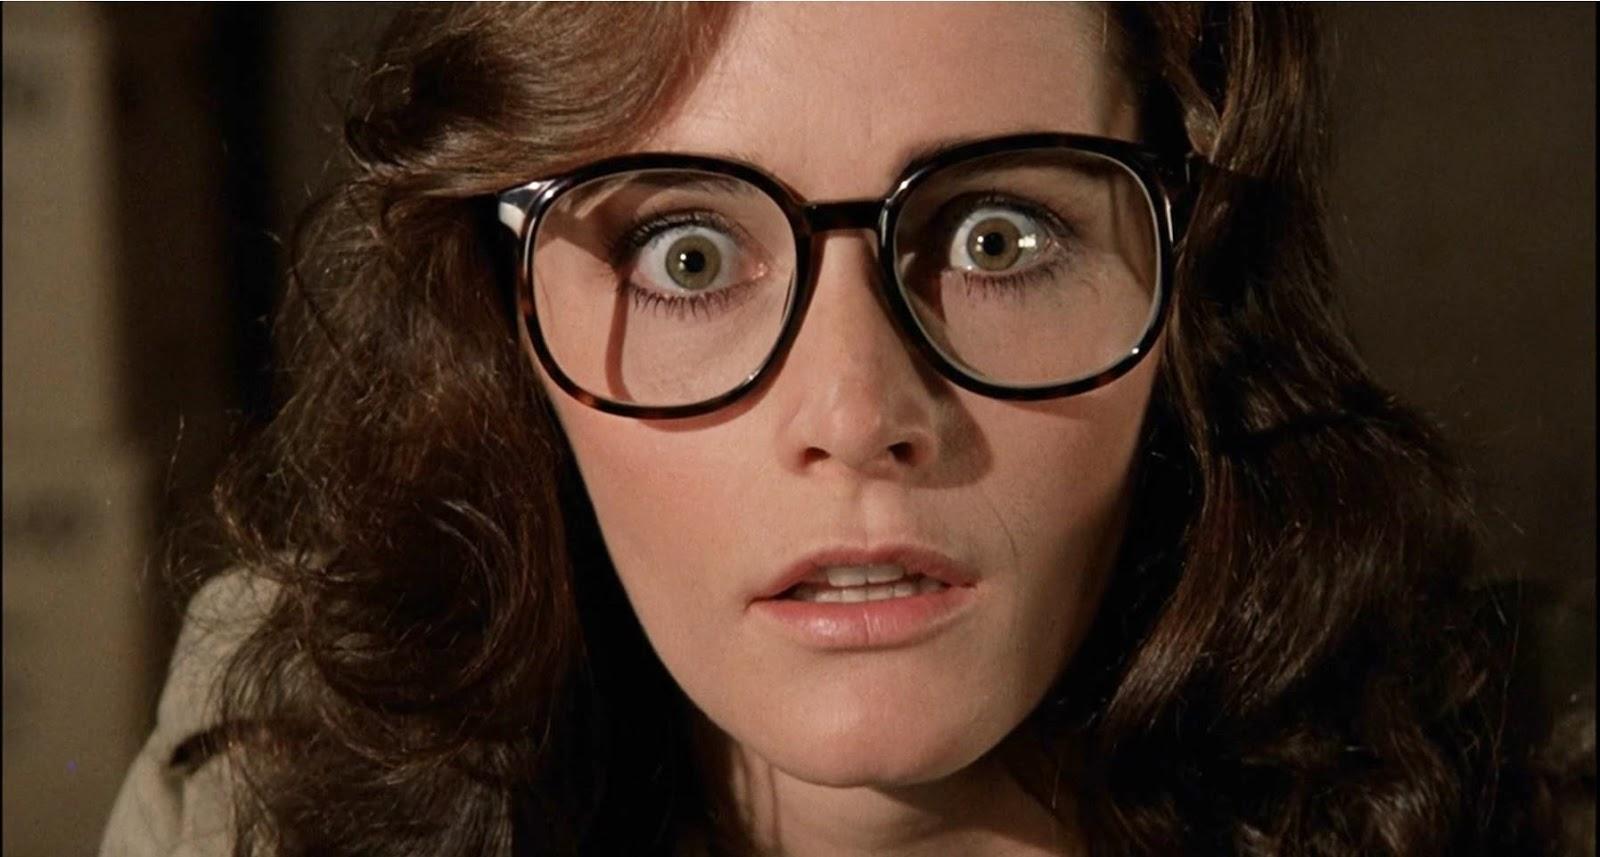 Margot-Kidder-Amityville-Horror-1979 (2)mrhorrorpedia